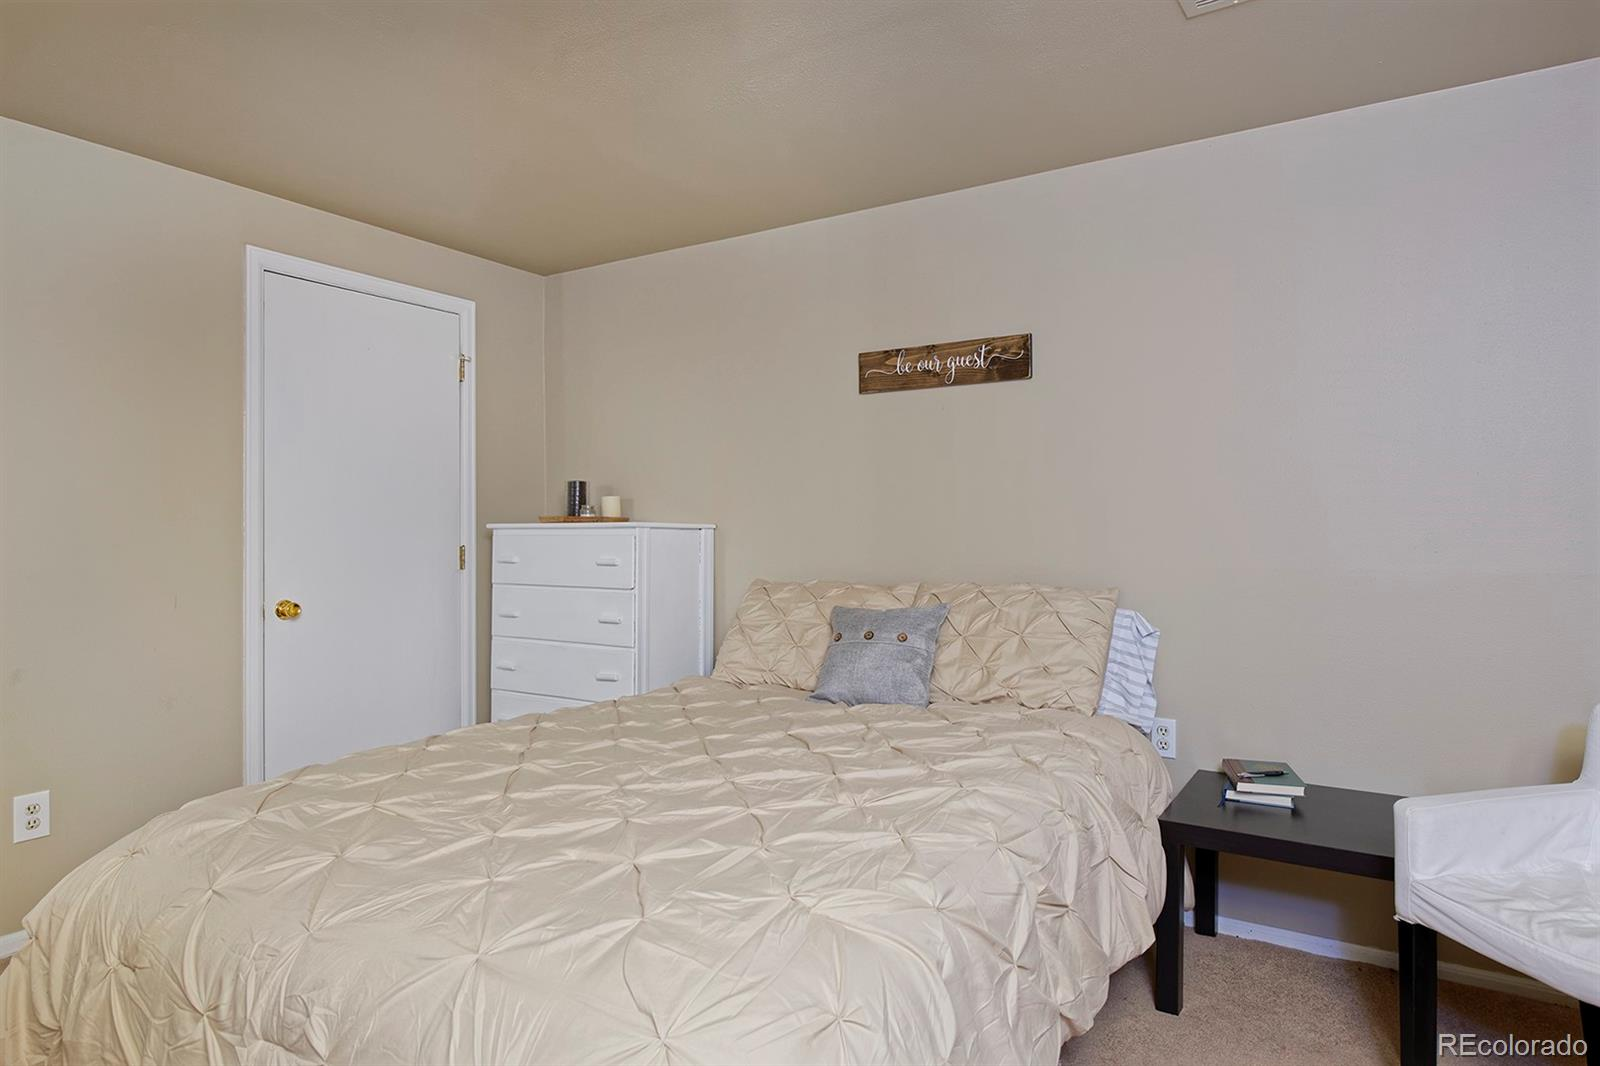 MLS# 4527585 - 25 - 13276 Callisto Drive, Littleton, CO 80124